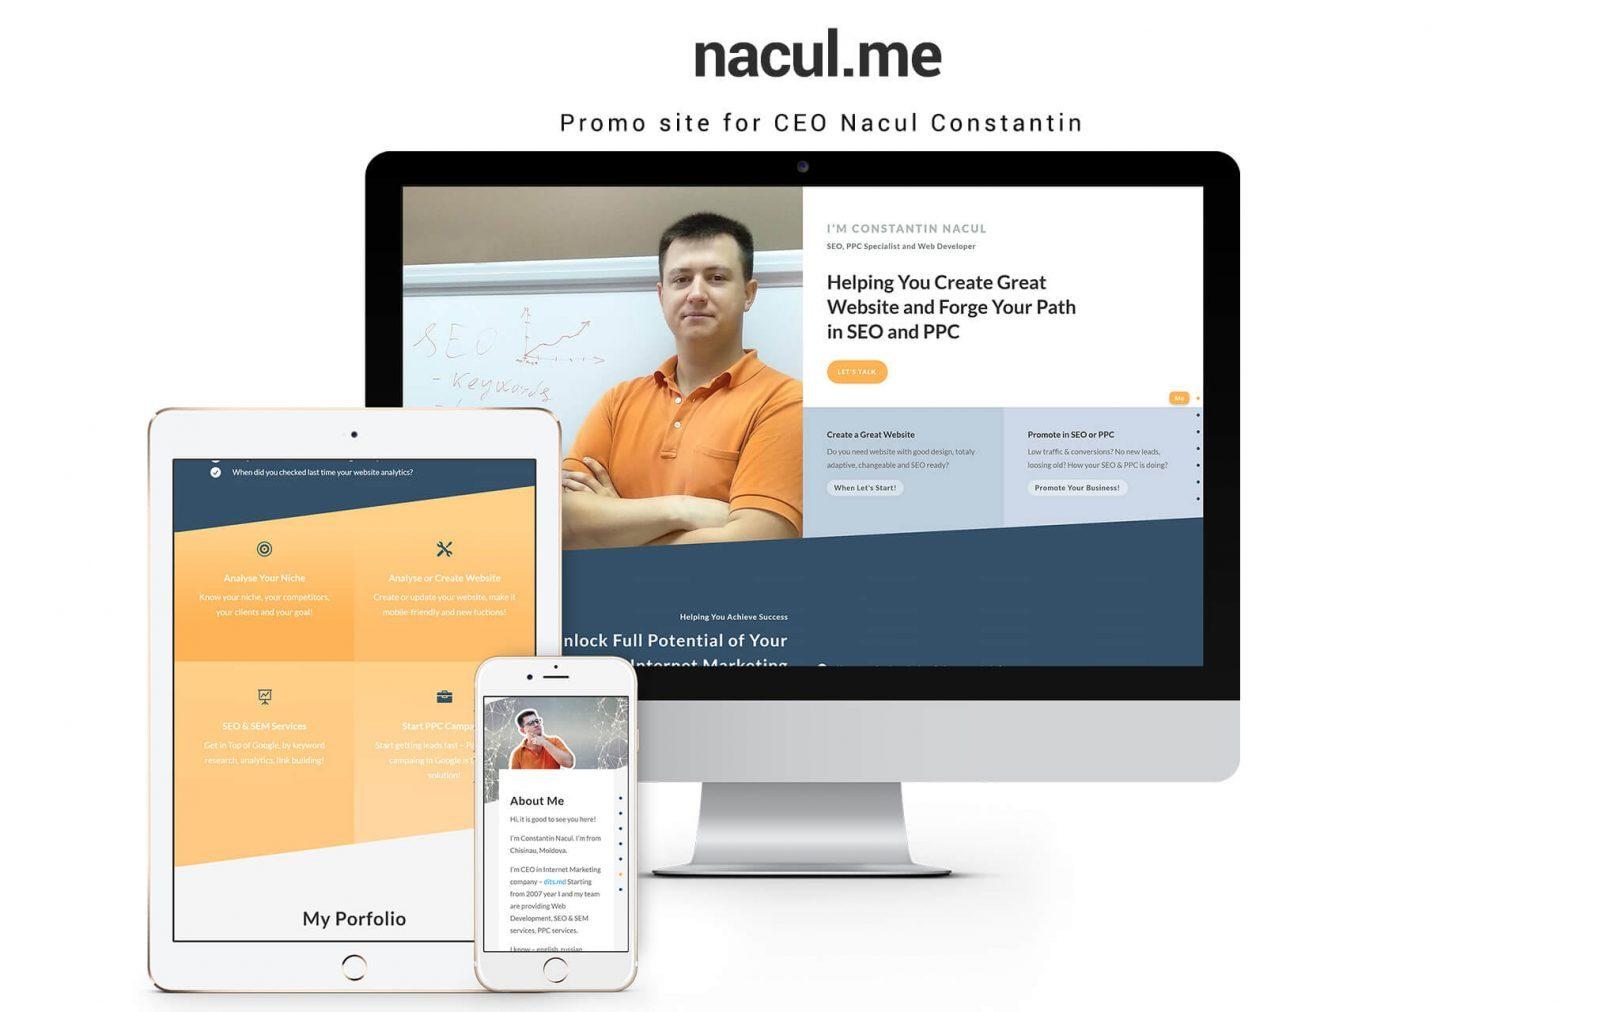 Сайт визитка для веб-разработчика, SEO/PPC специалиста 1